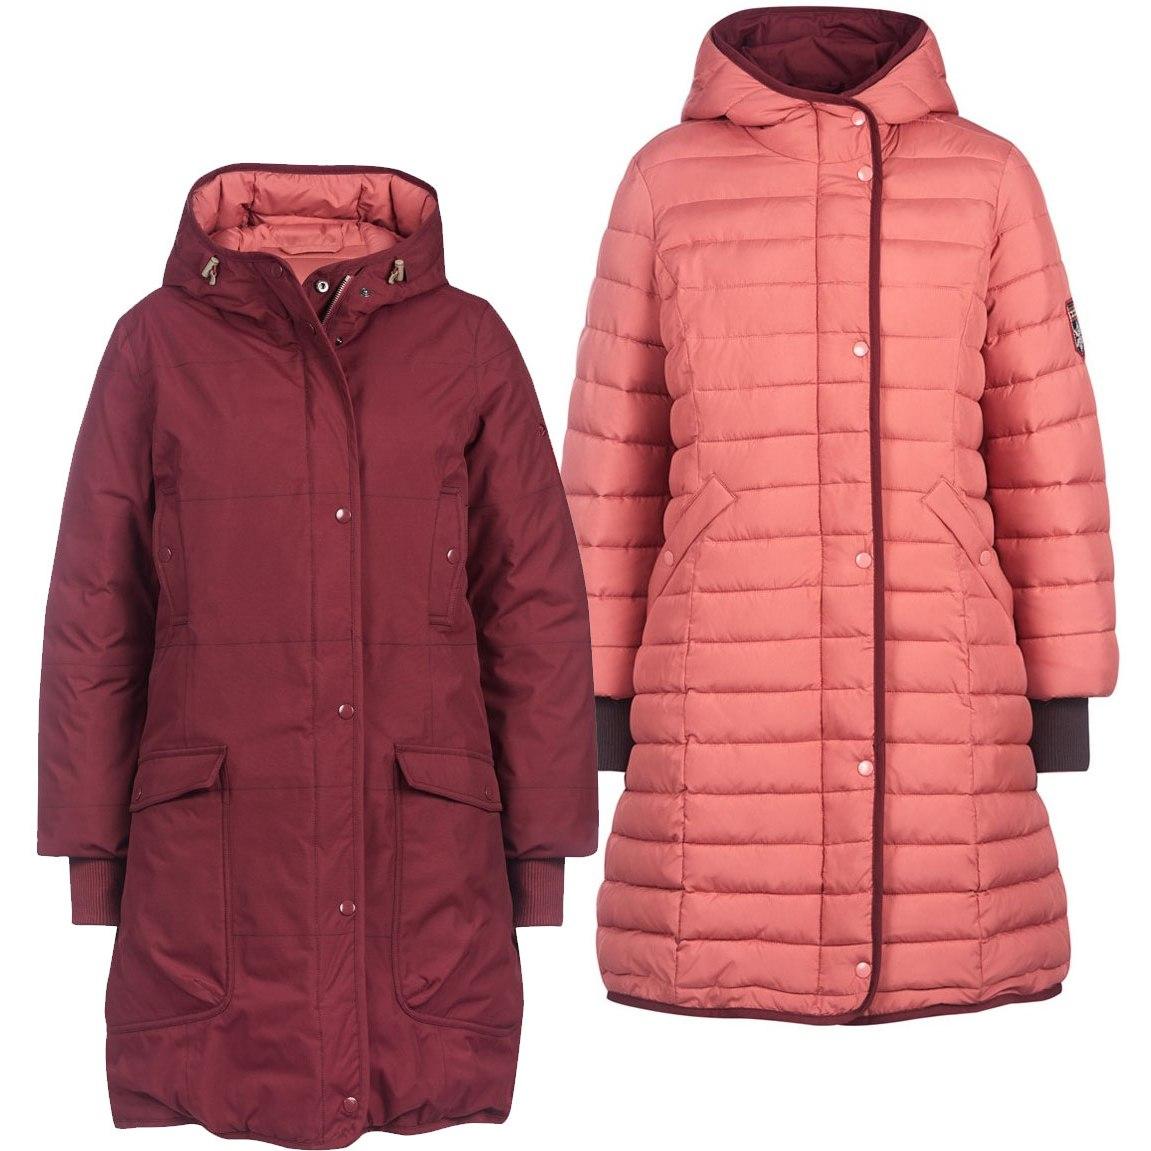 Finside SMILLA Women Reversible Winter Jacket - cabernet/rose